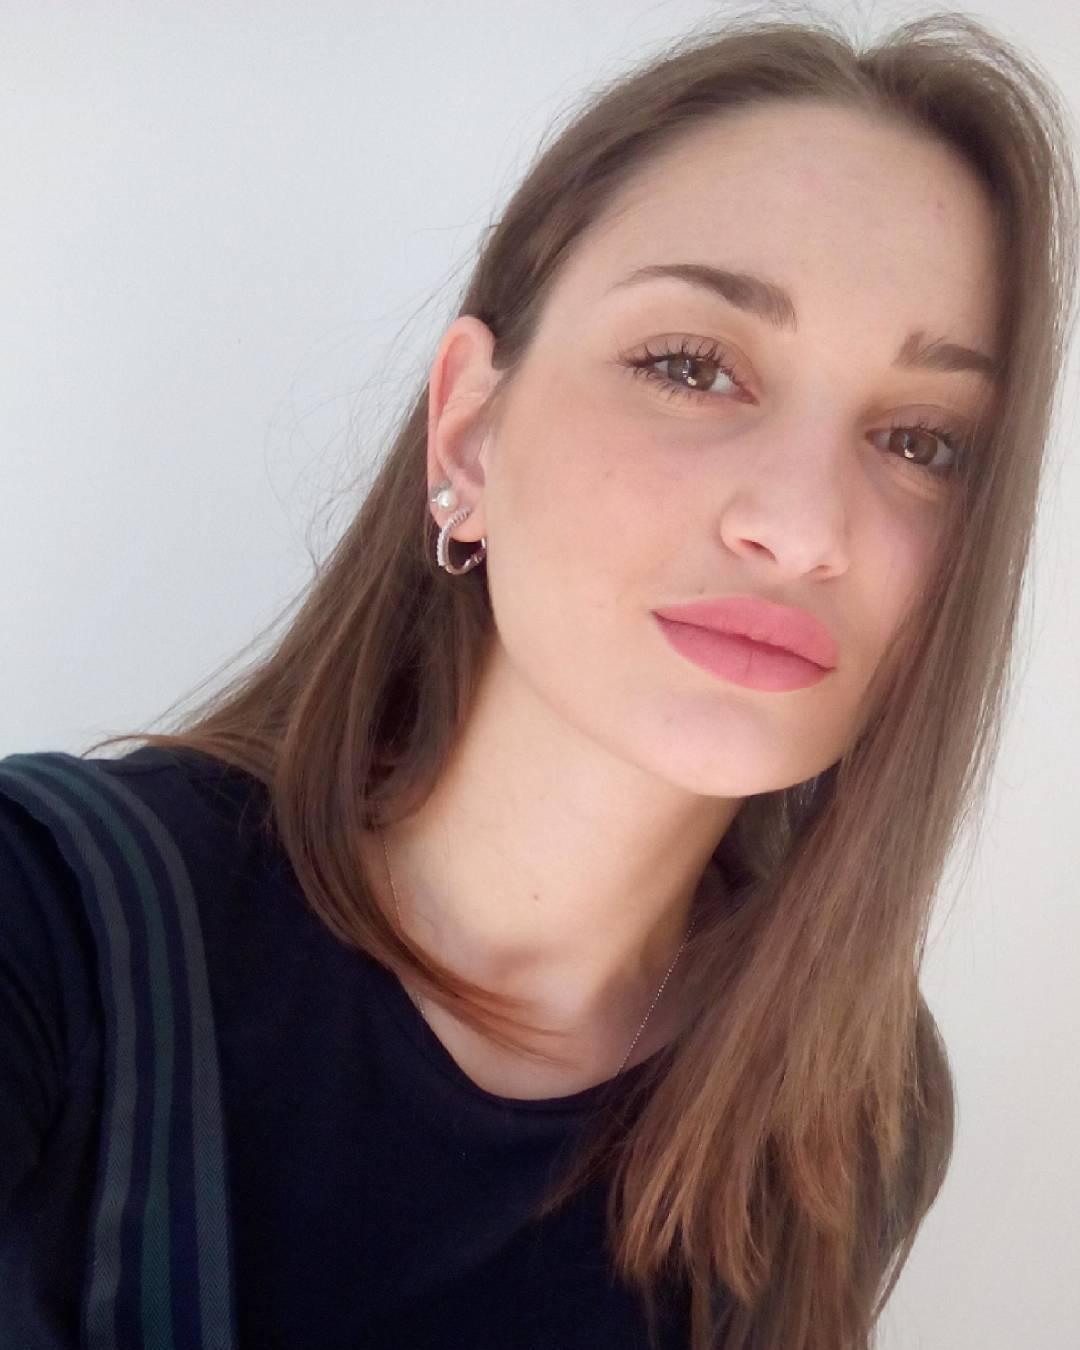 Alessia bonari 3